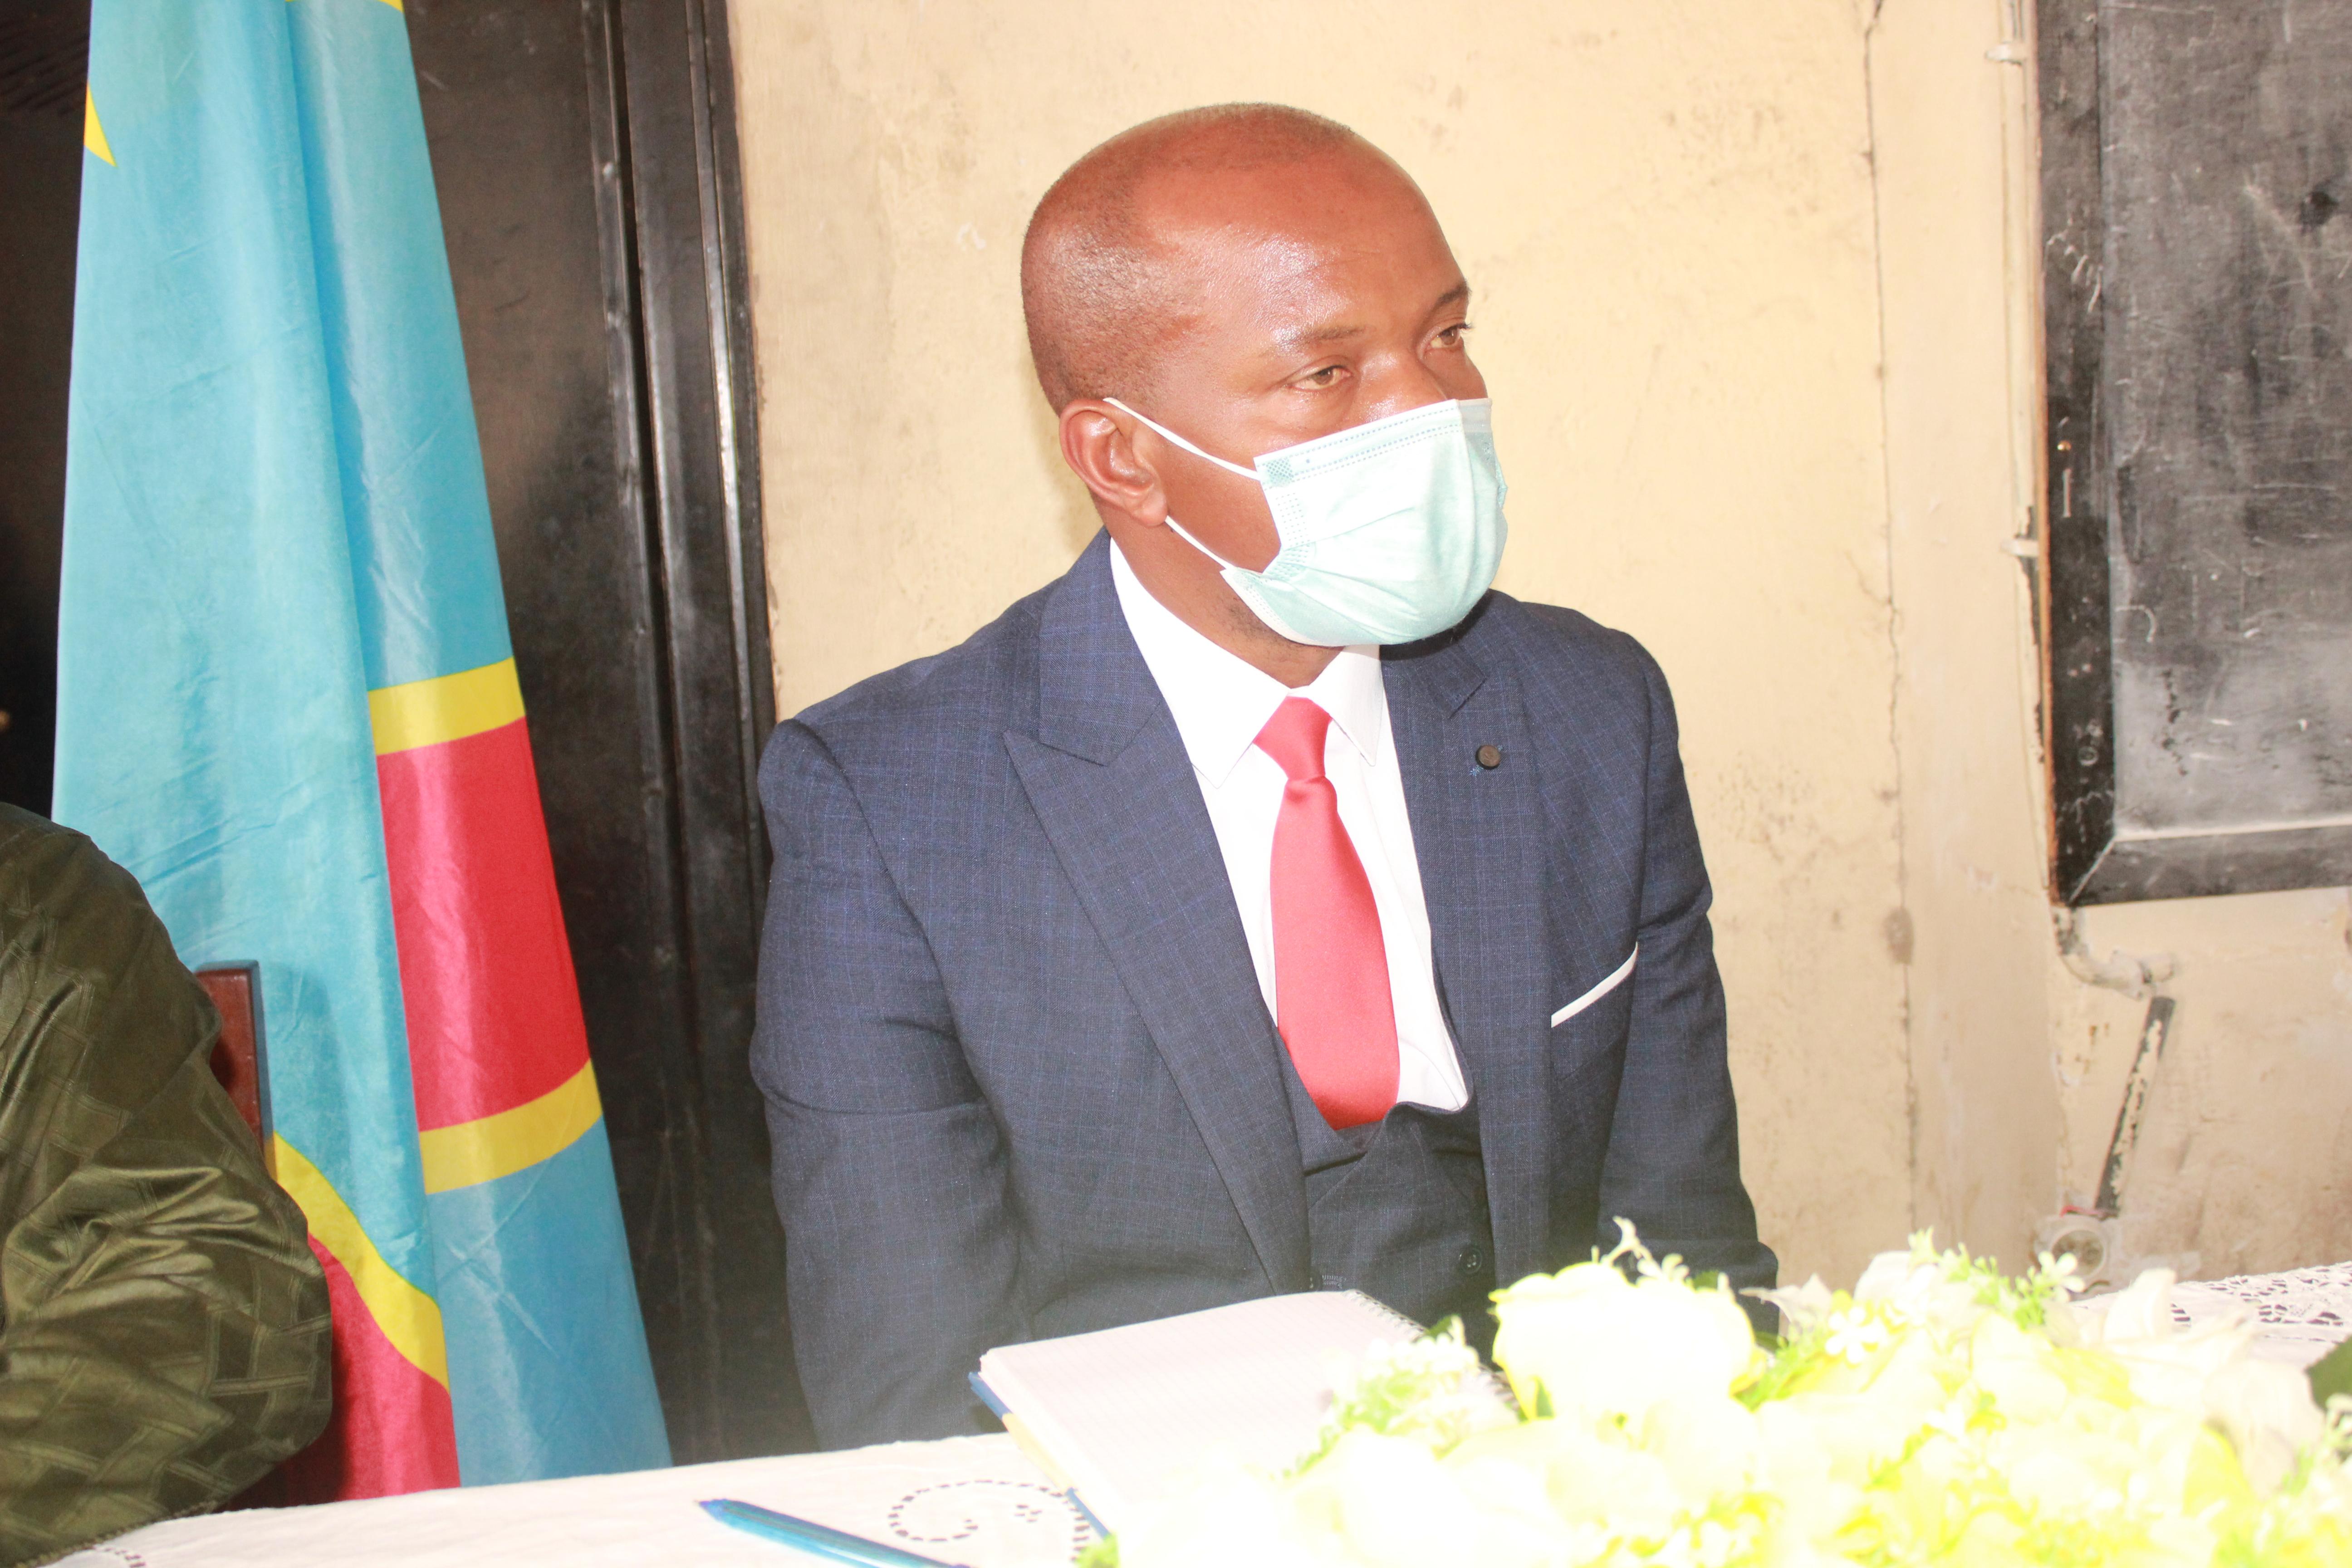 Le Recteur de l'Université de Goma, Professeur MUHINDO MUGHANDA